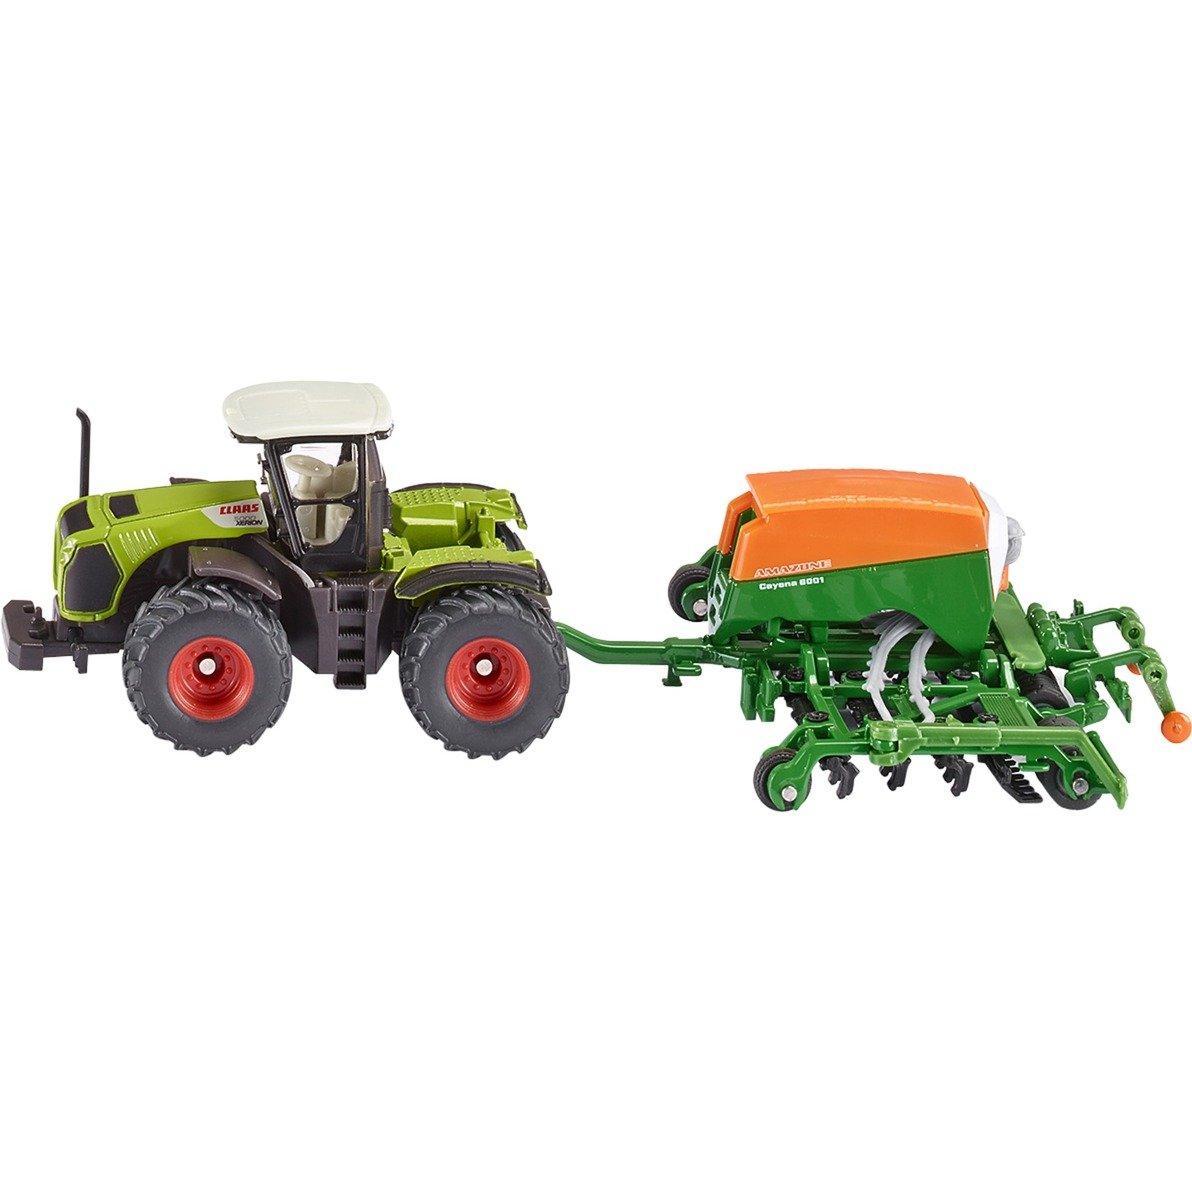 1826 Previamente montado Modelo a escala de tractor 1:87 modelo de vehículo de tierra, Automóvil de construcción